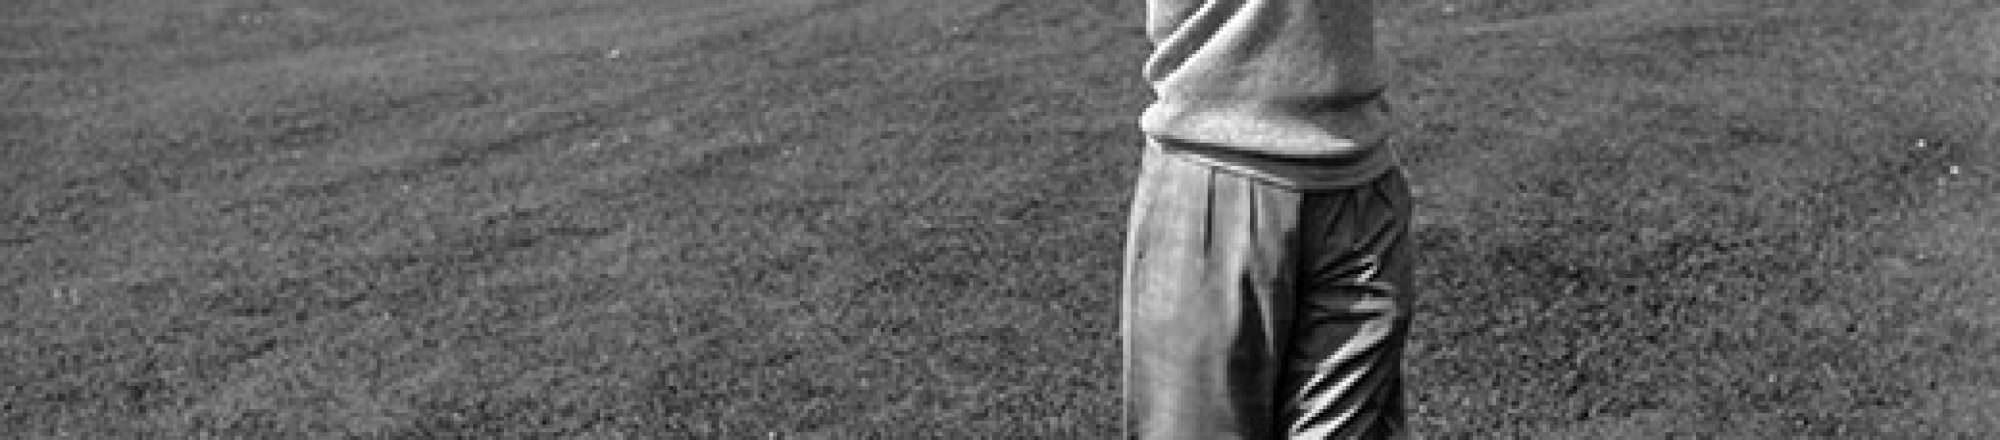 How Gene Sarazen left his mark on Masters history